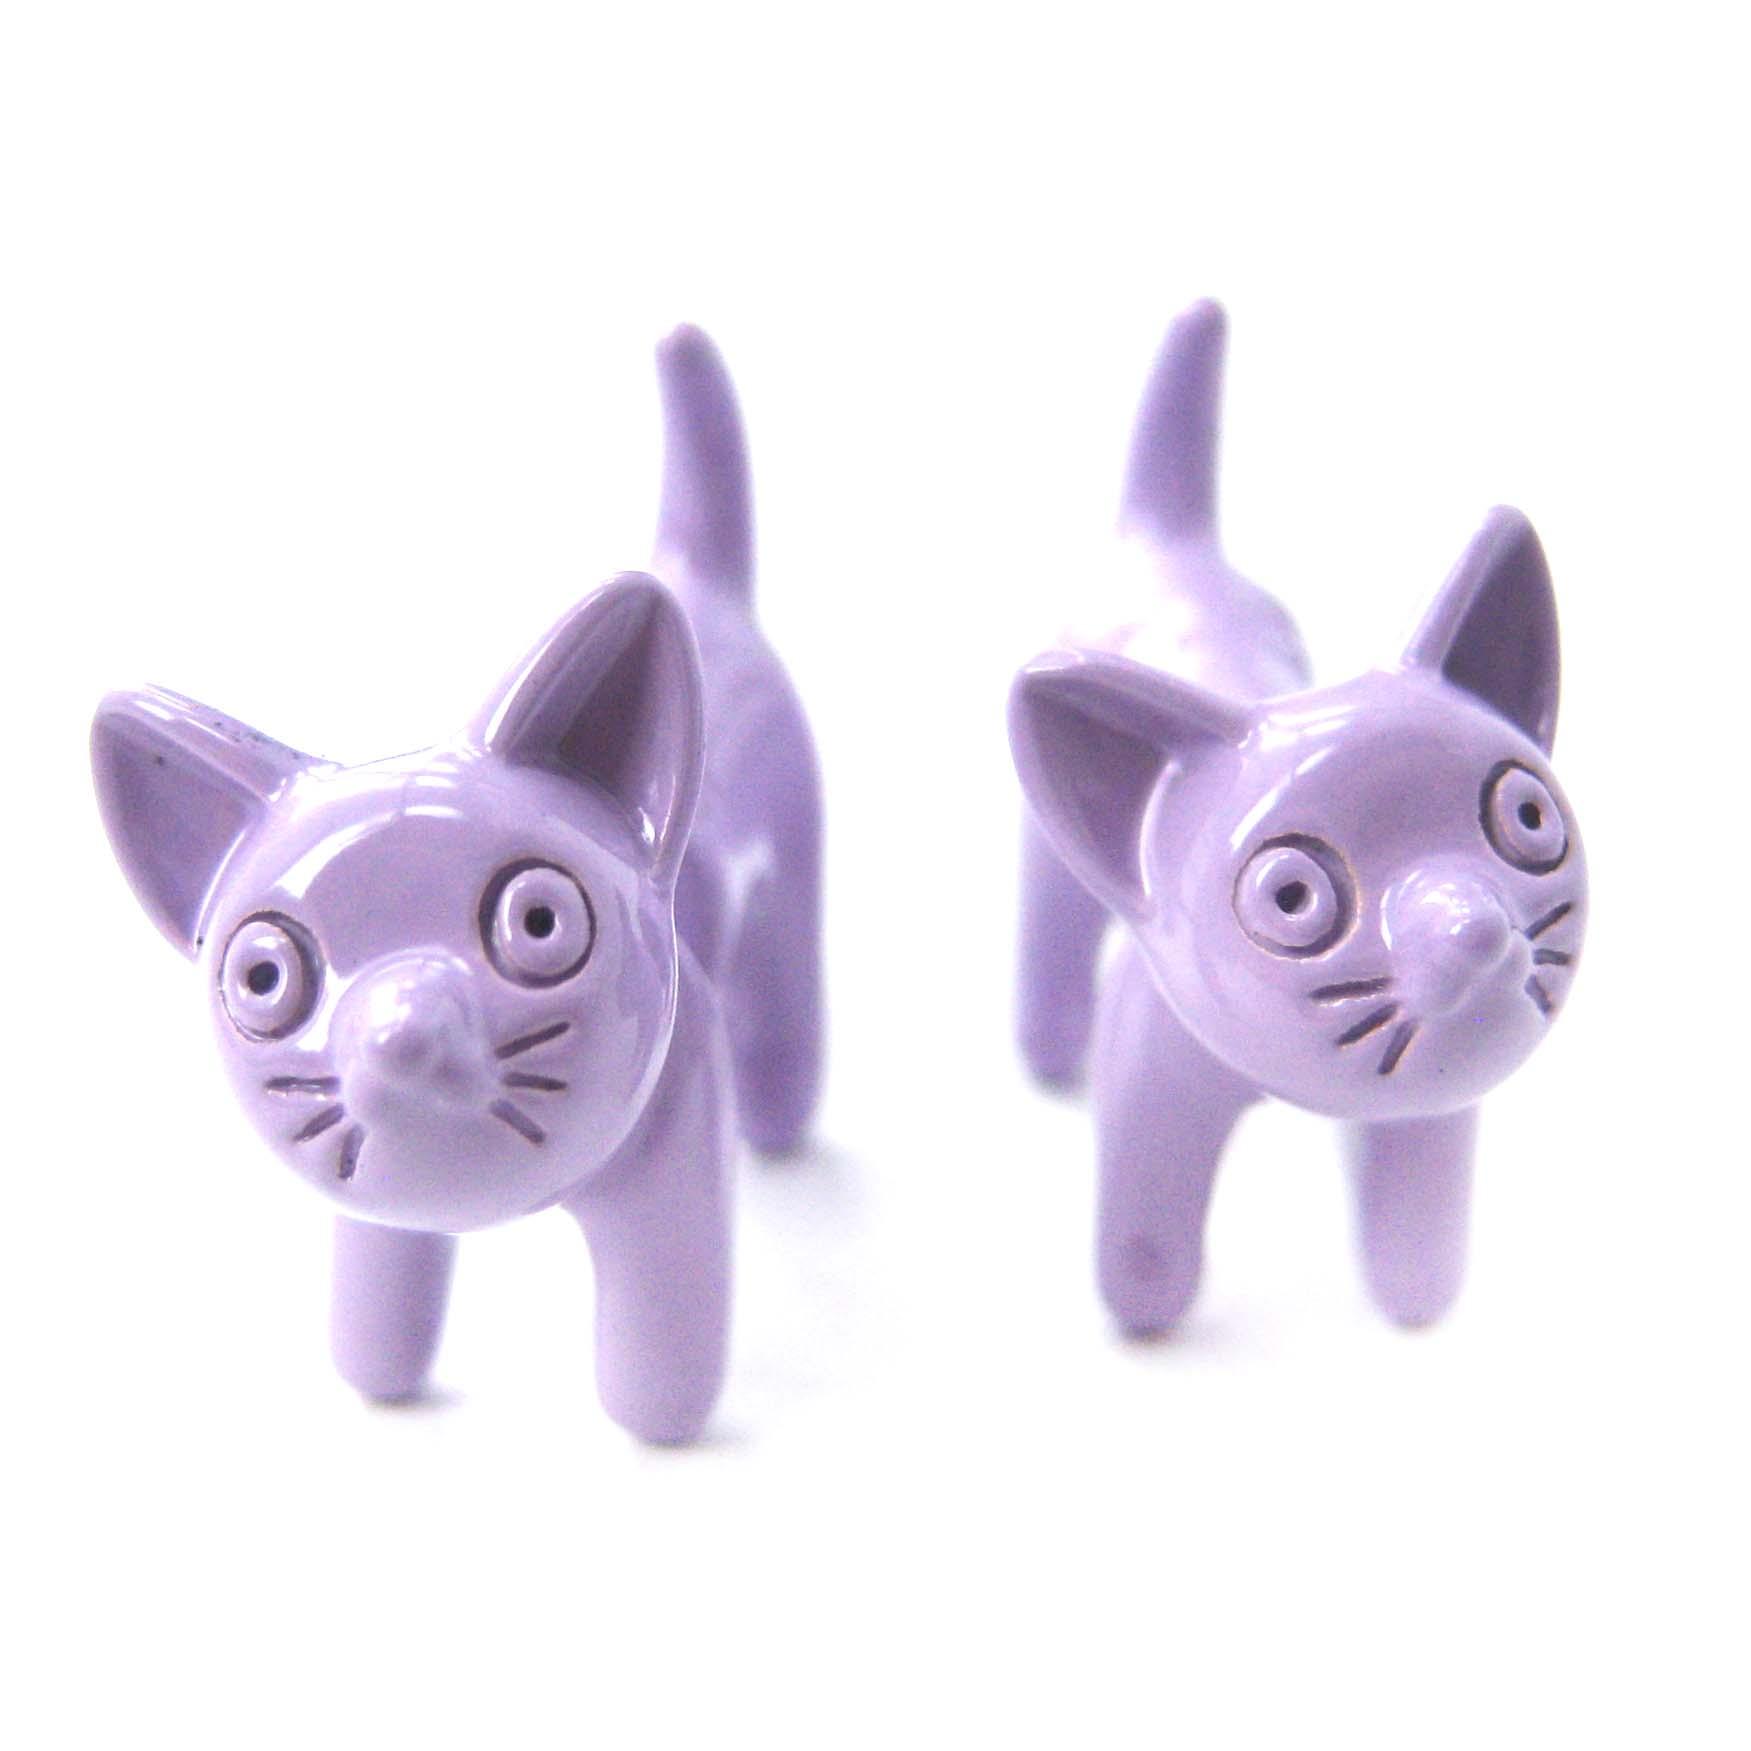 Adorable Fake Gauge Earrings Kitty Cat Animal Stud Earrings In Light Purple